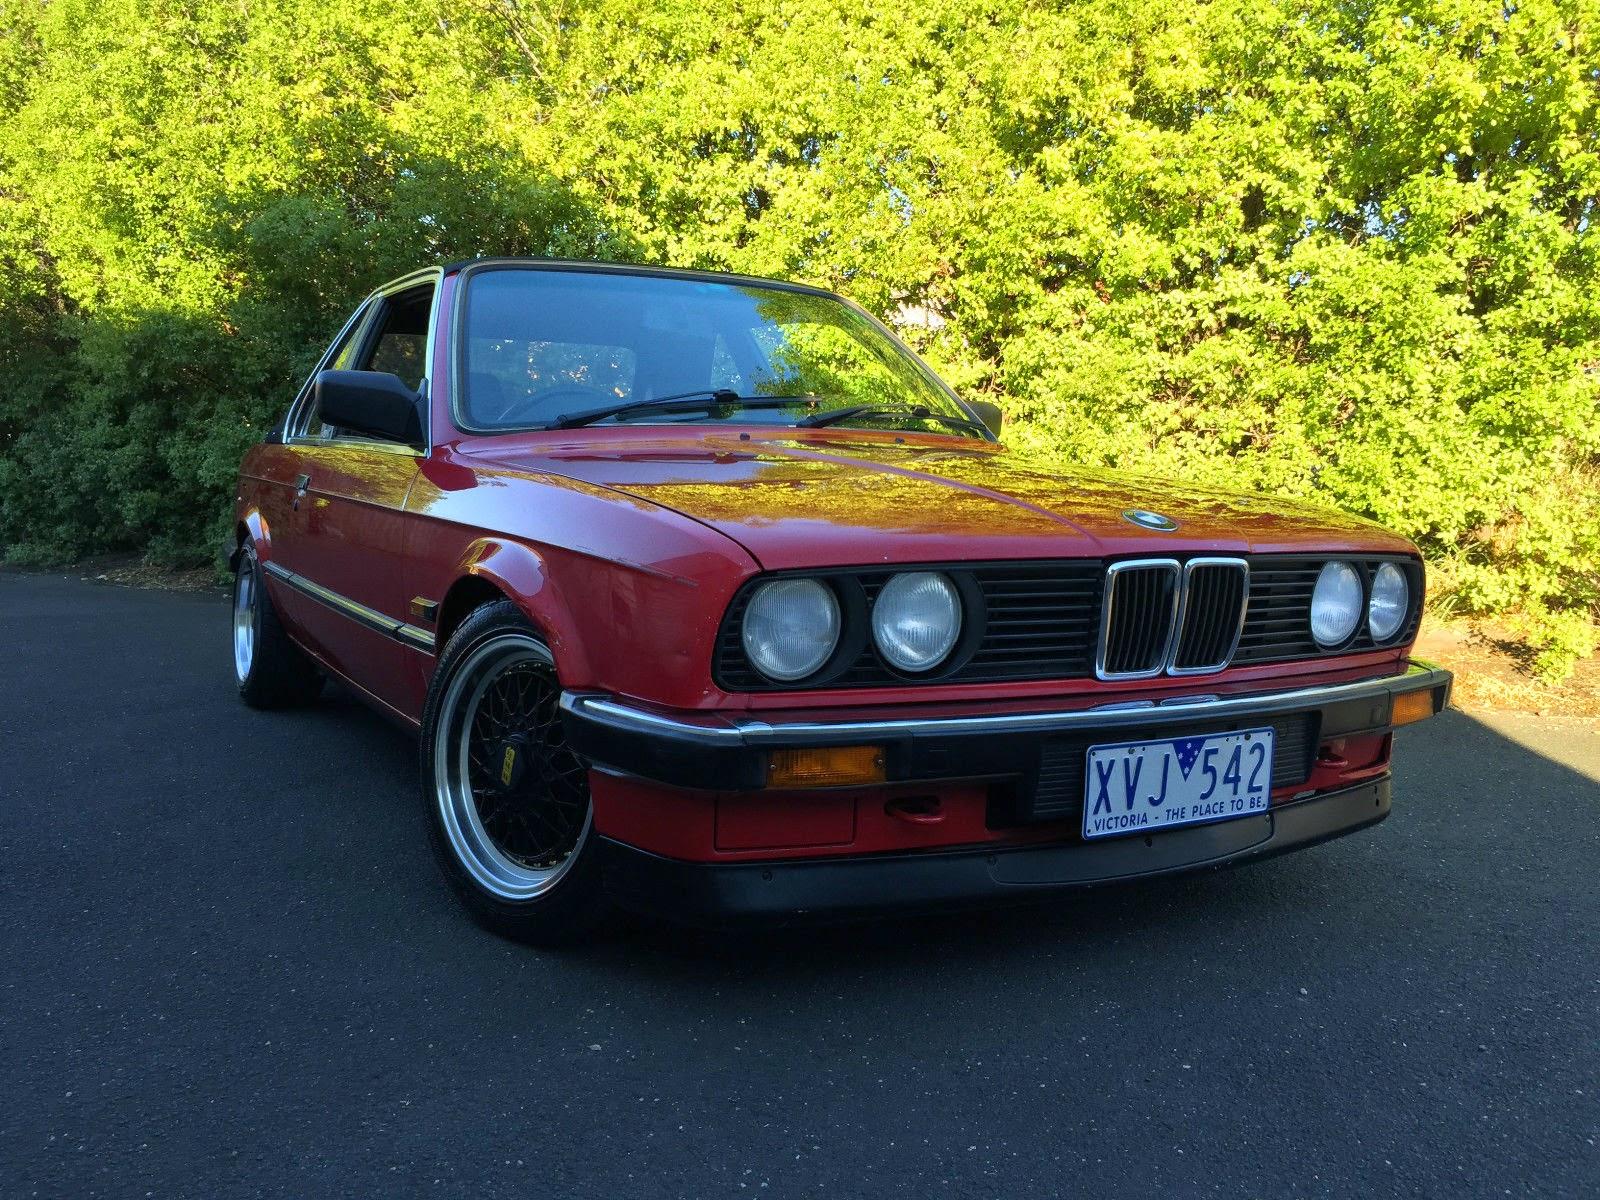 1985 BMW E30 318i TC Baur Manual for Sale in Australia!